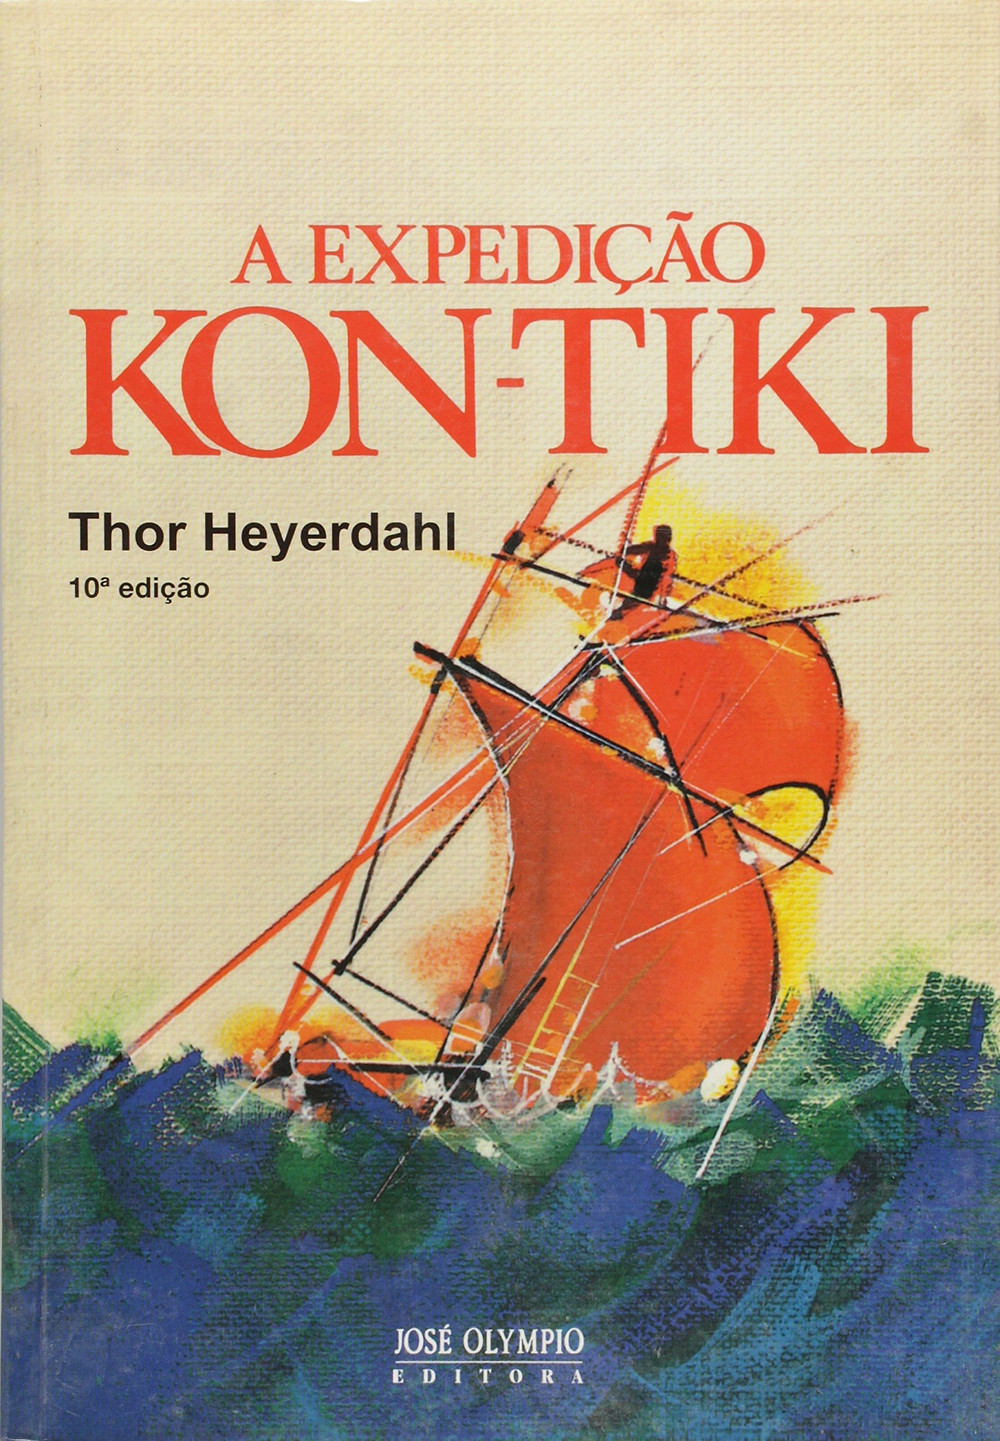 Expedição Kin Tiki